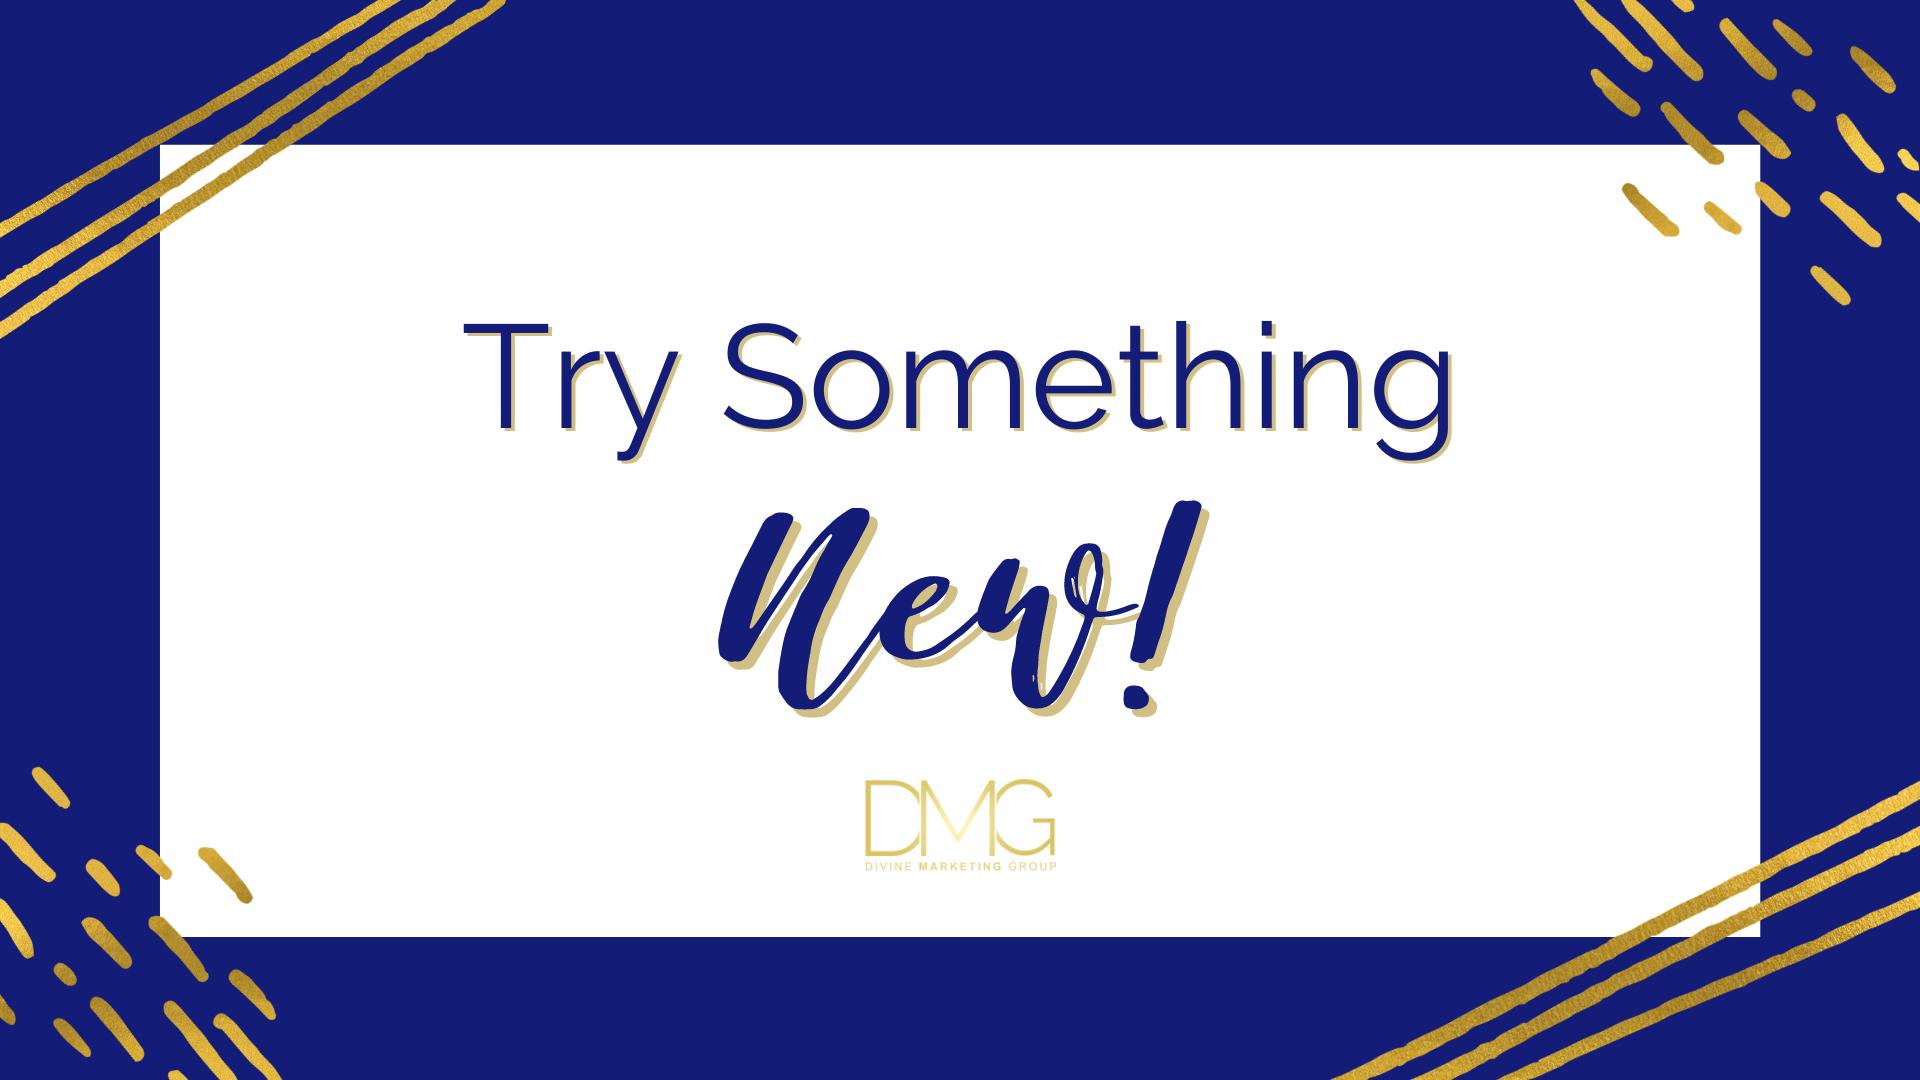 Marketing Tip 1 - Try Something New